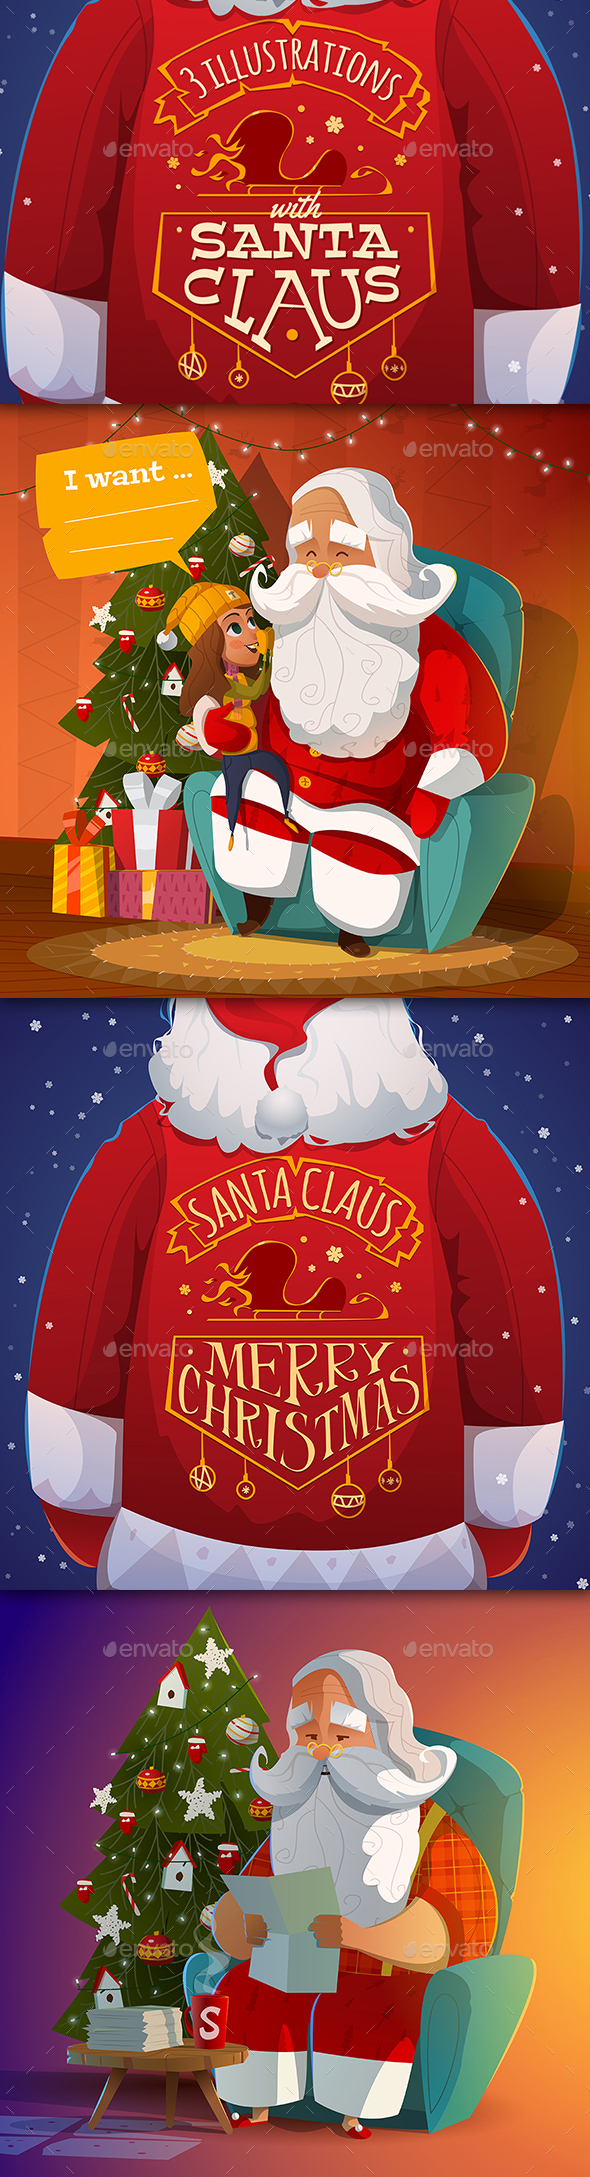 3 Santa Claus Illustrations - Christmas Seasons/Holidays